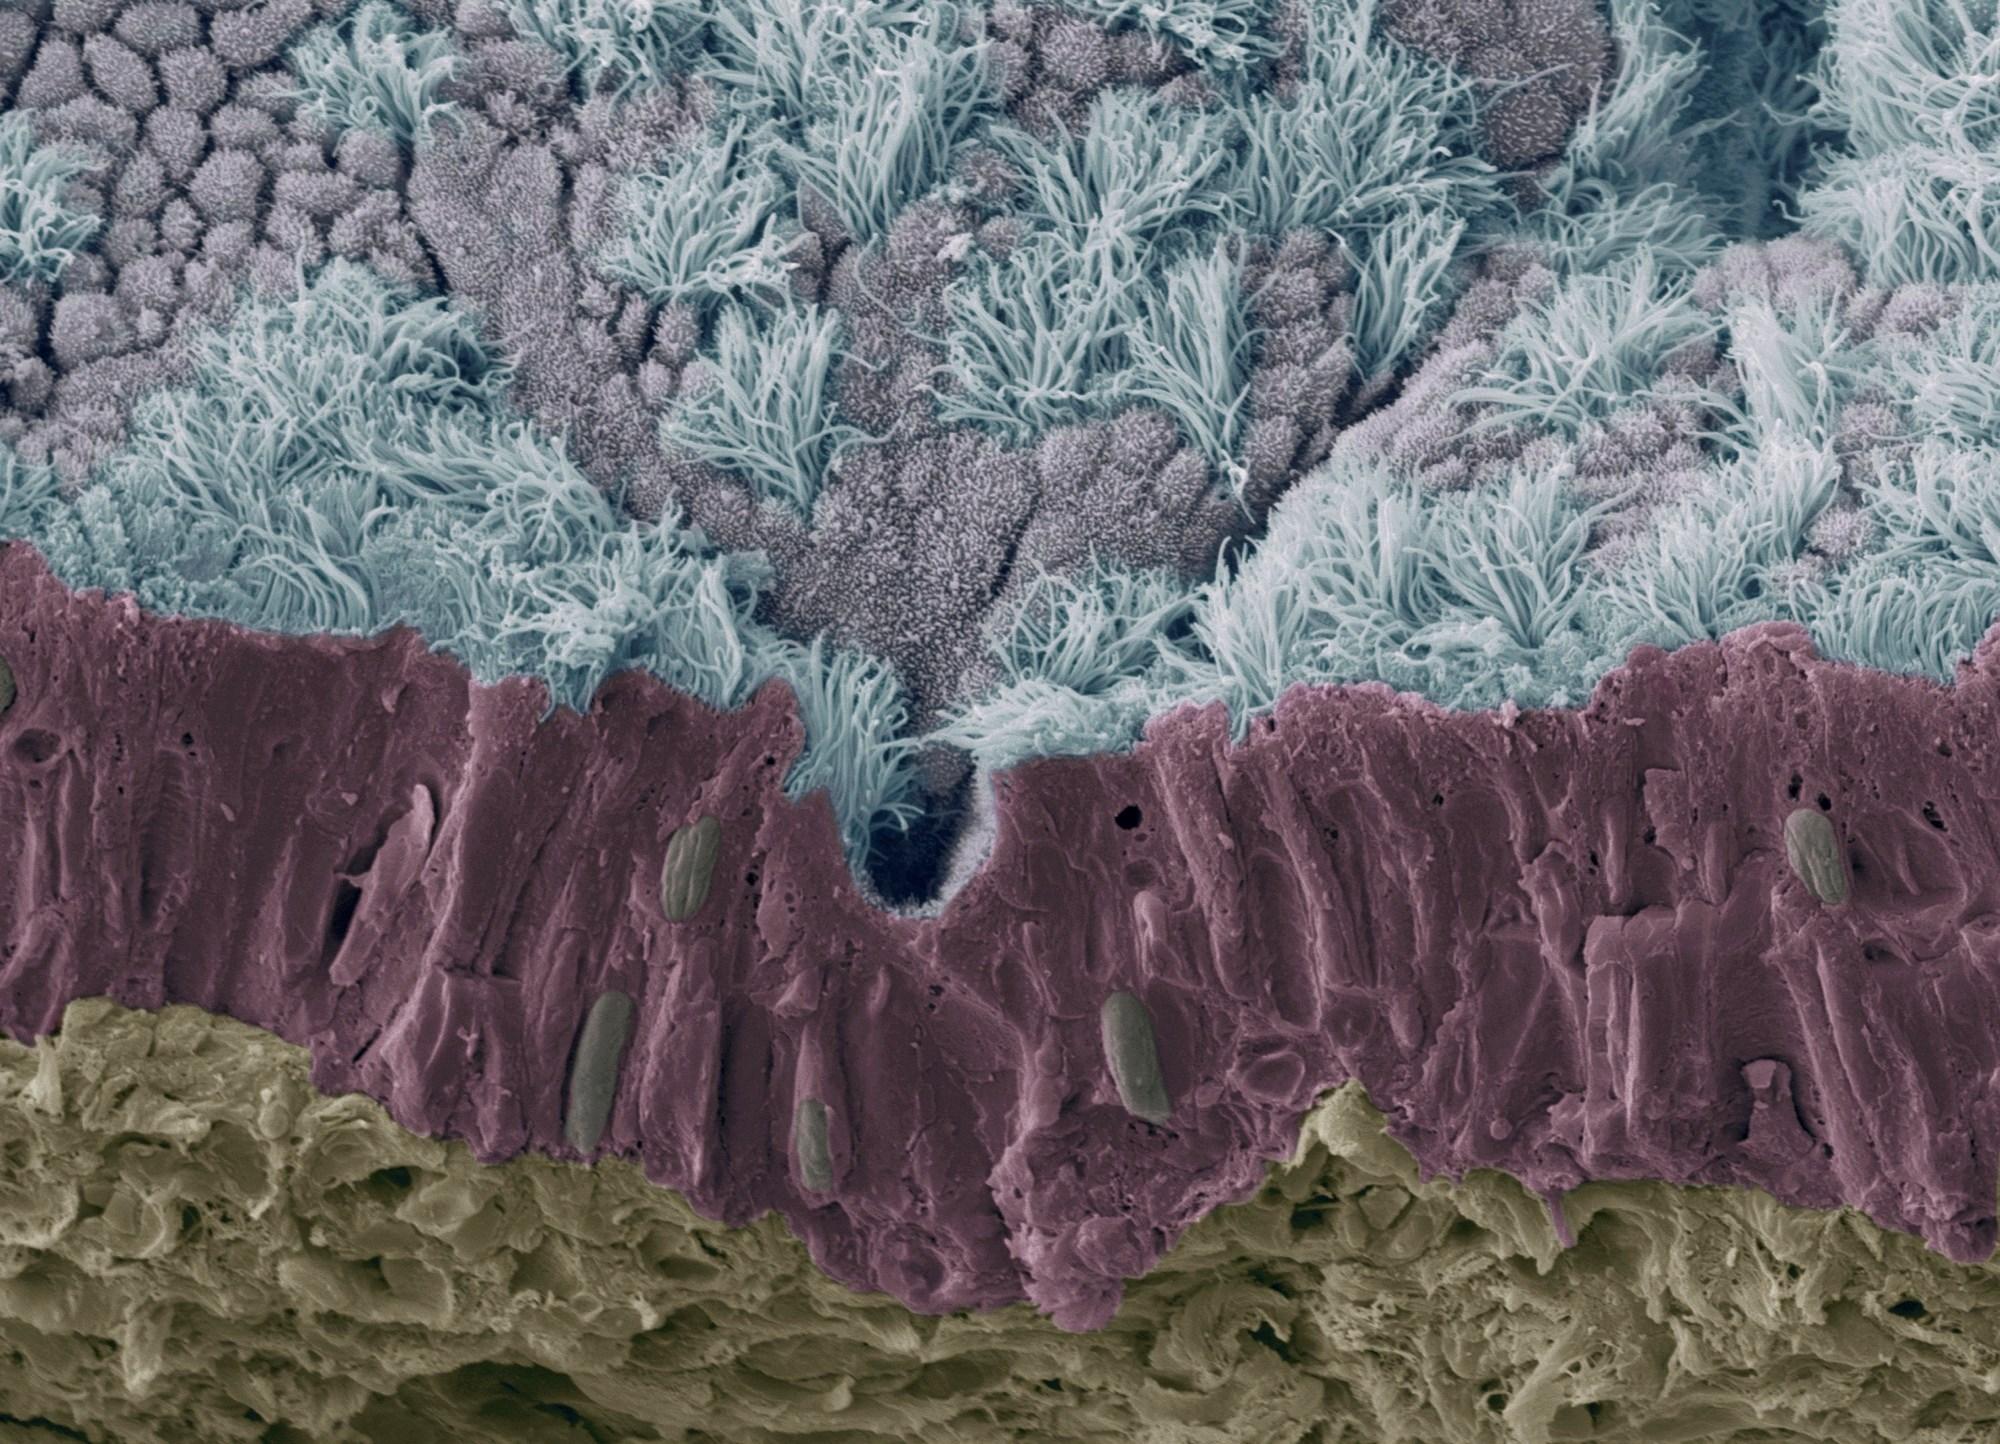 Tobramycin Efficacy Decreased by Human Airway Mucus